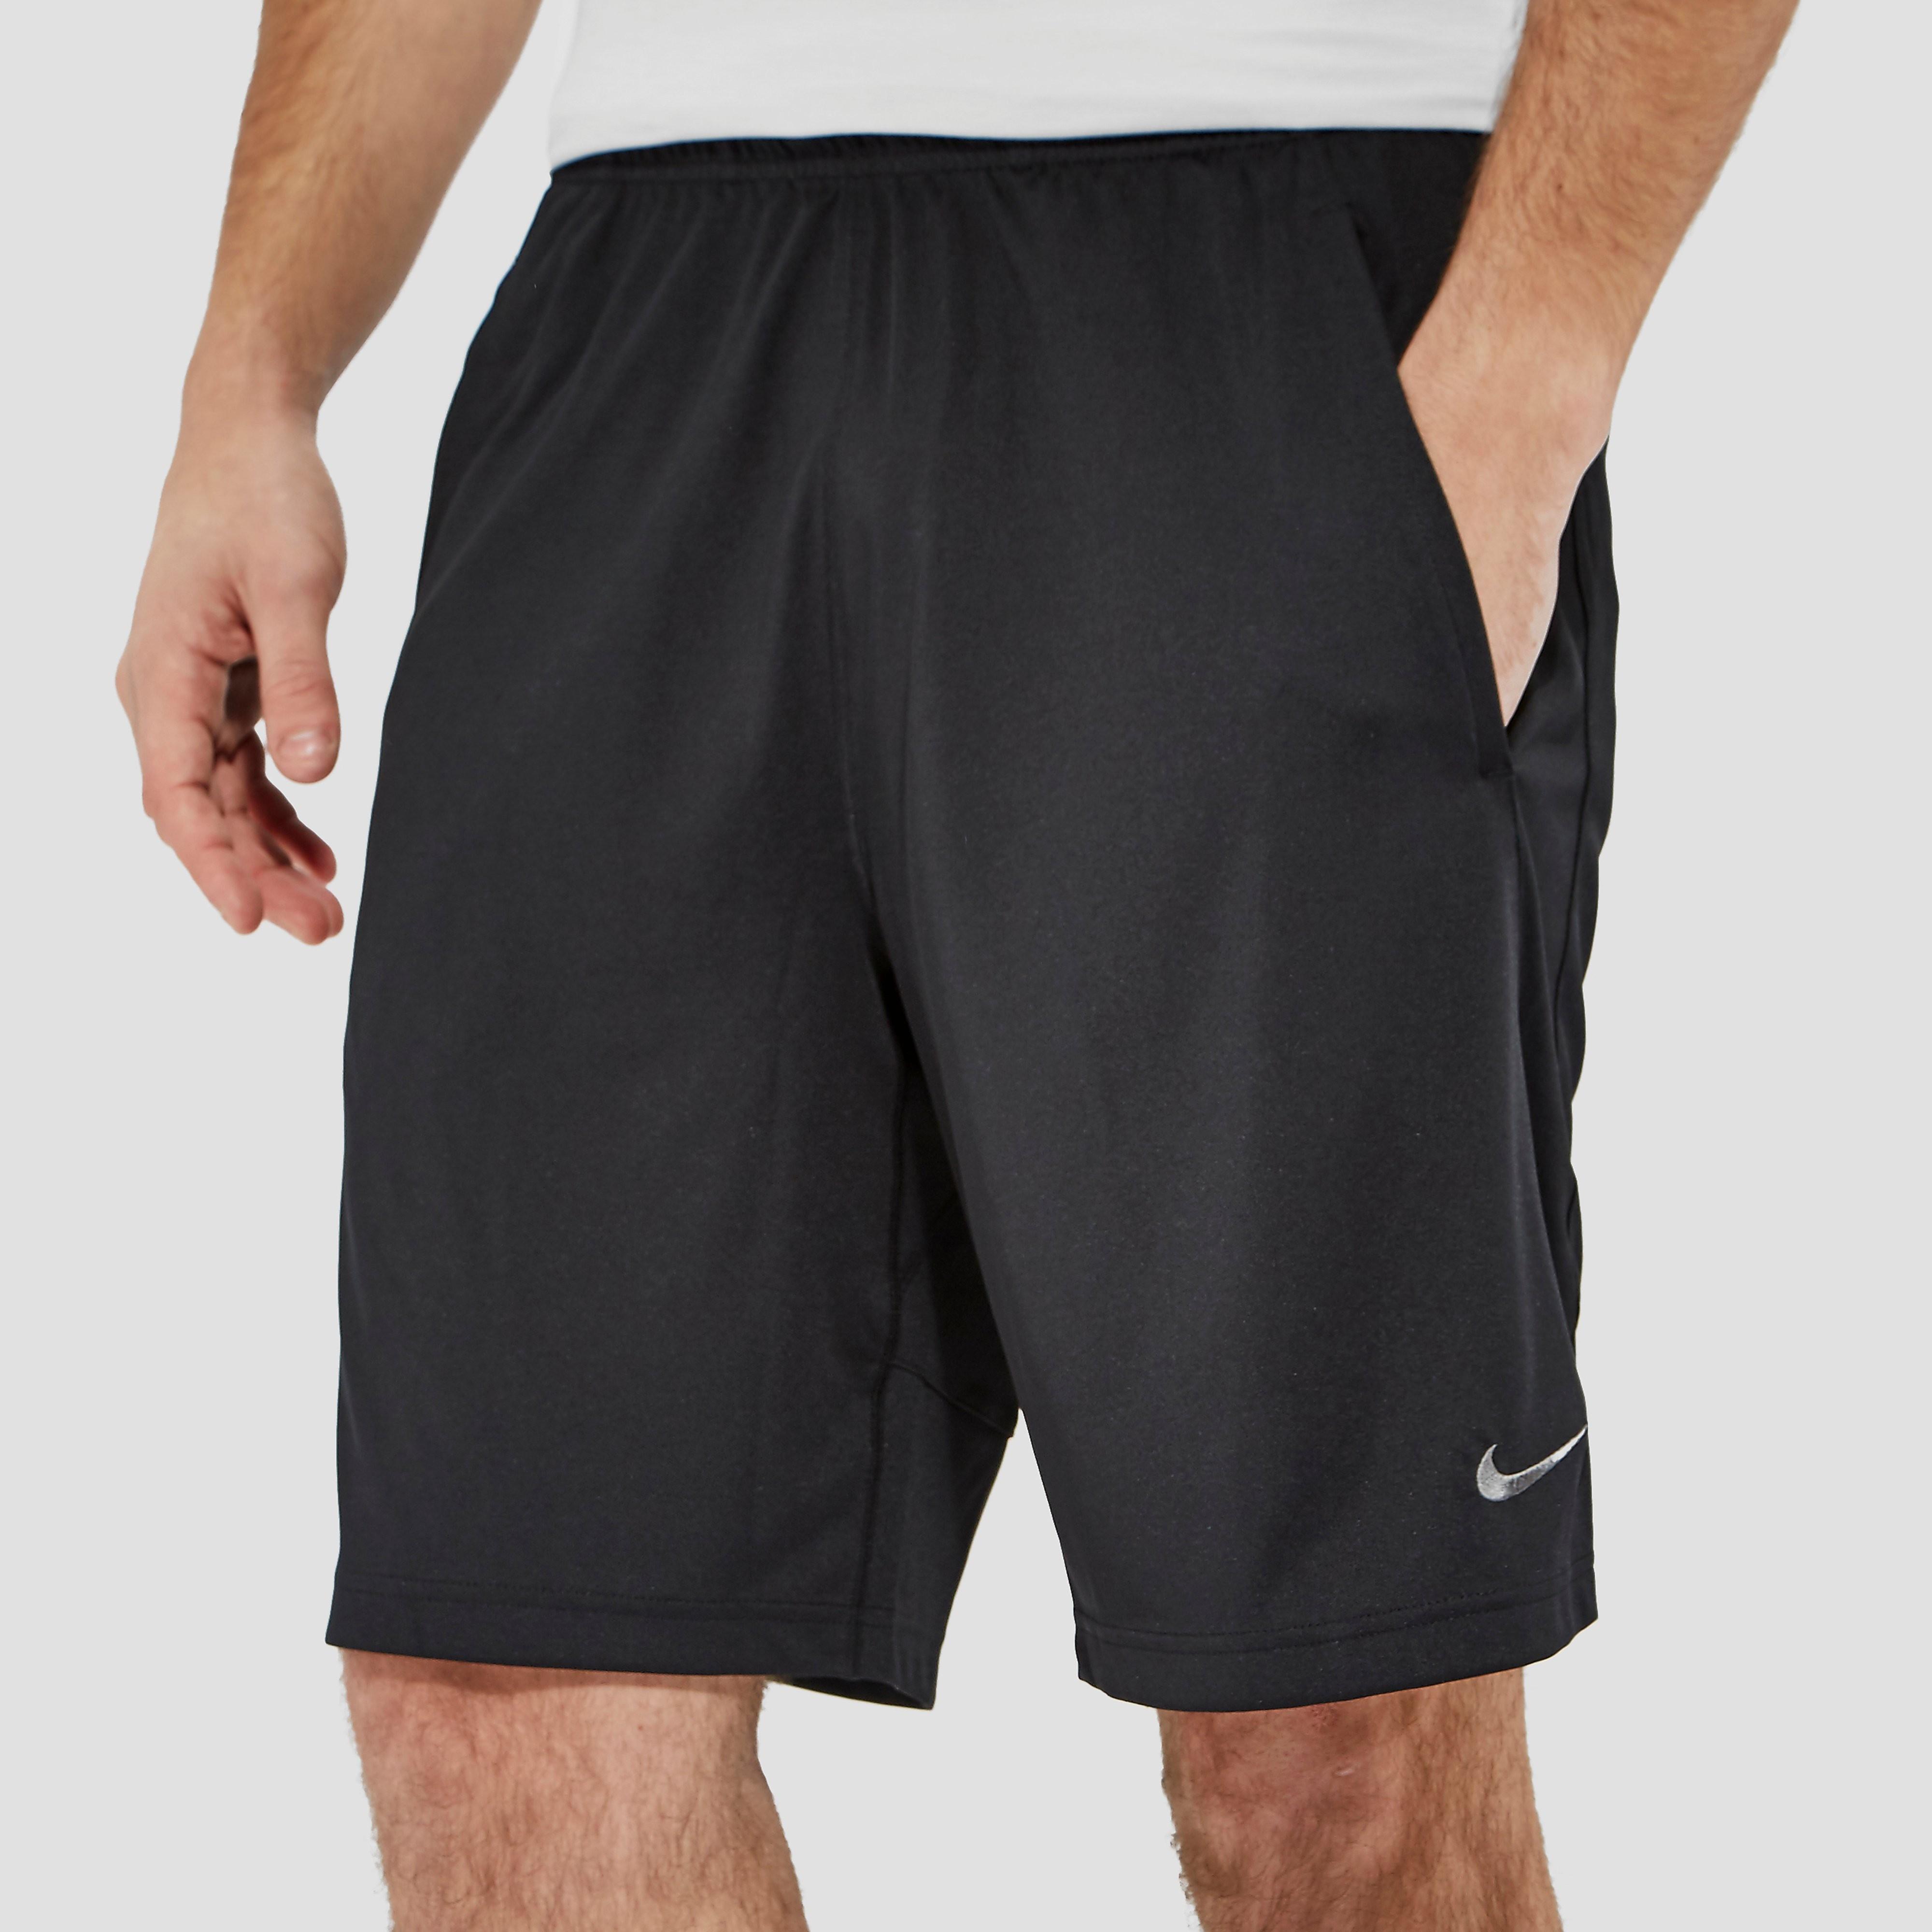 Nike Men's Fly 9 Inch Shorts